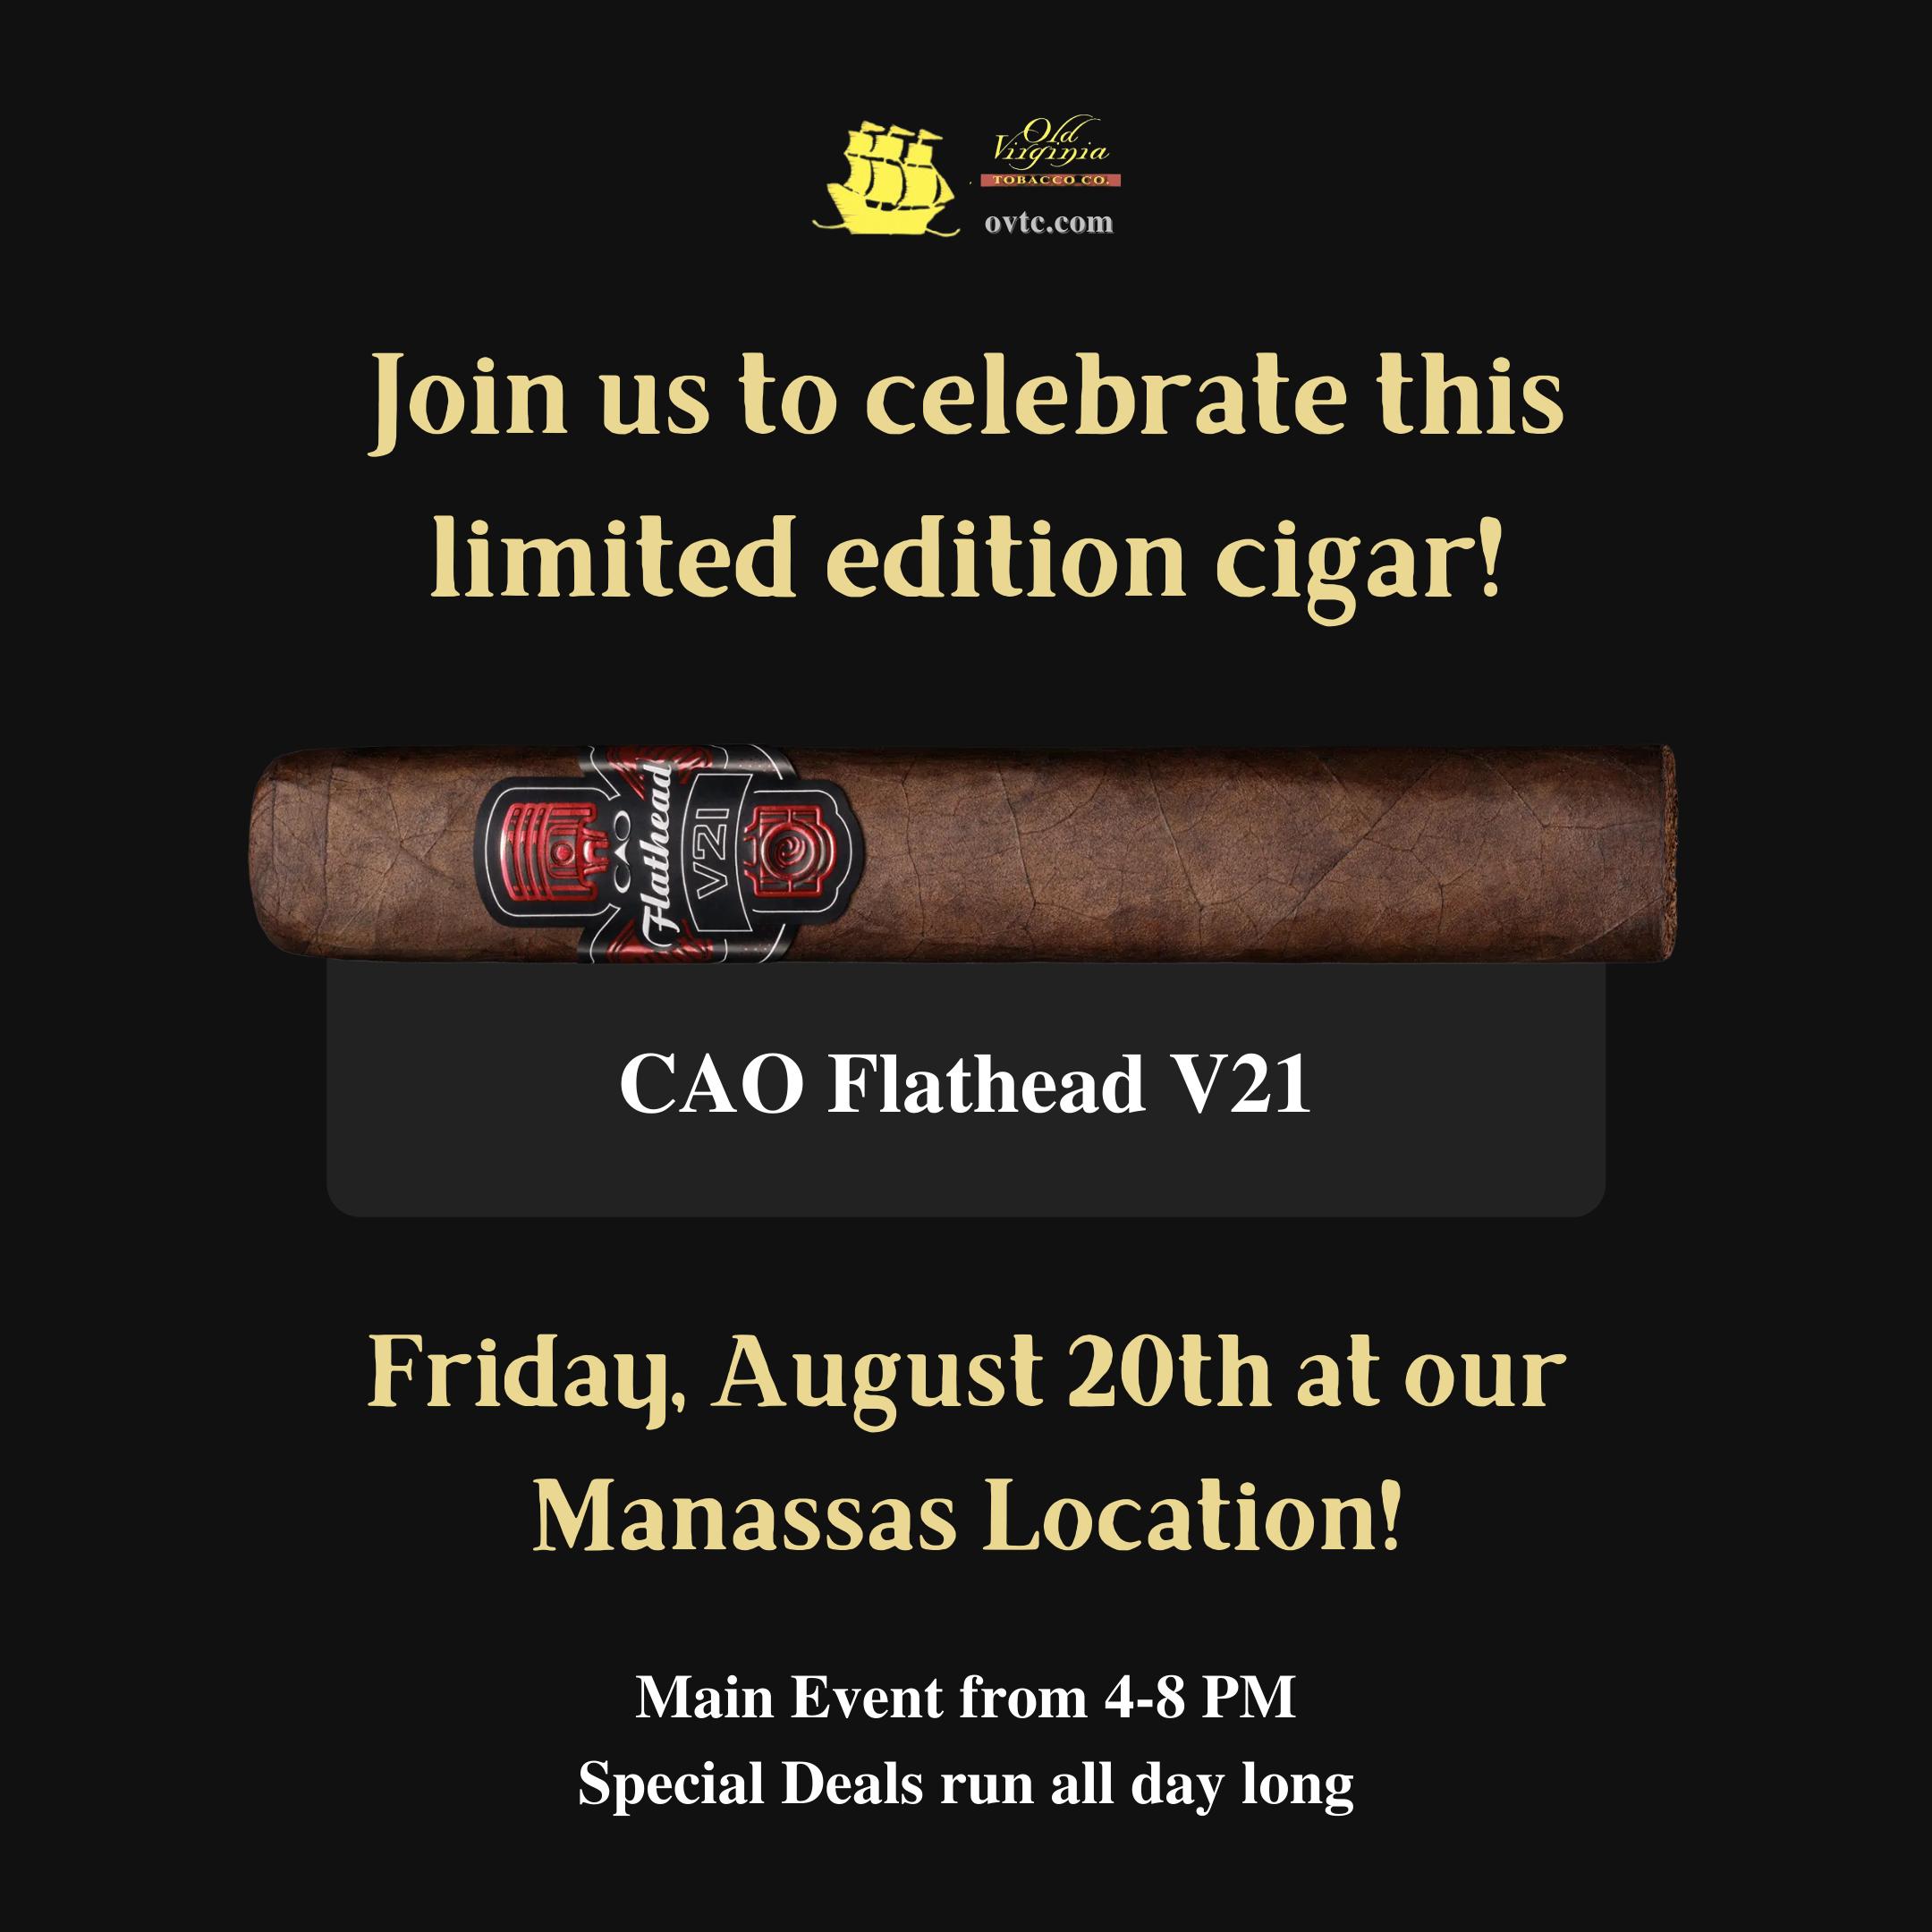 Limited Edition CAO Flathead V21 Event!